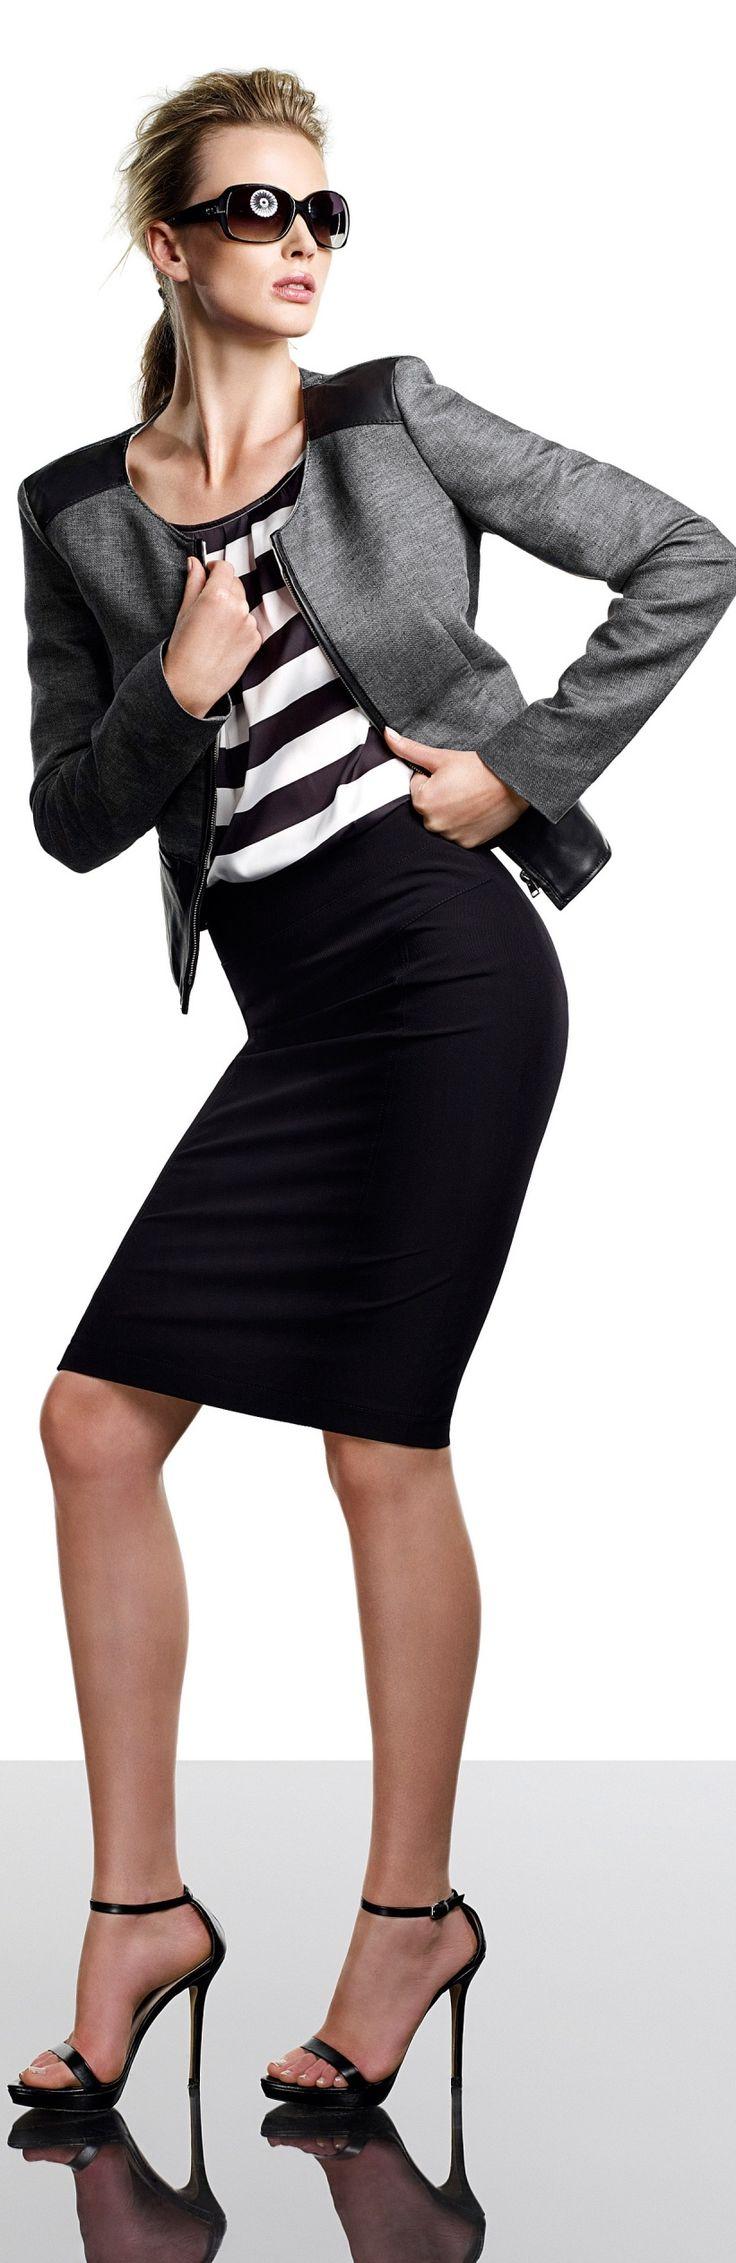 294 Best Womens Fashion Images On Pinterest Fashion Fashion